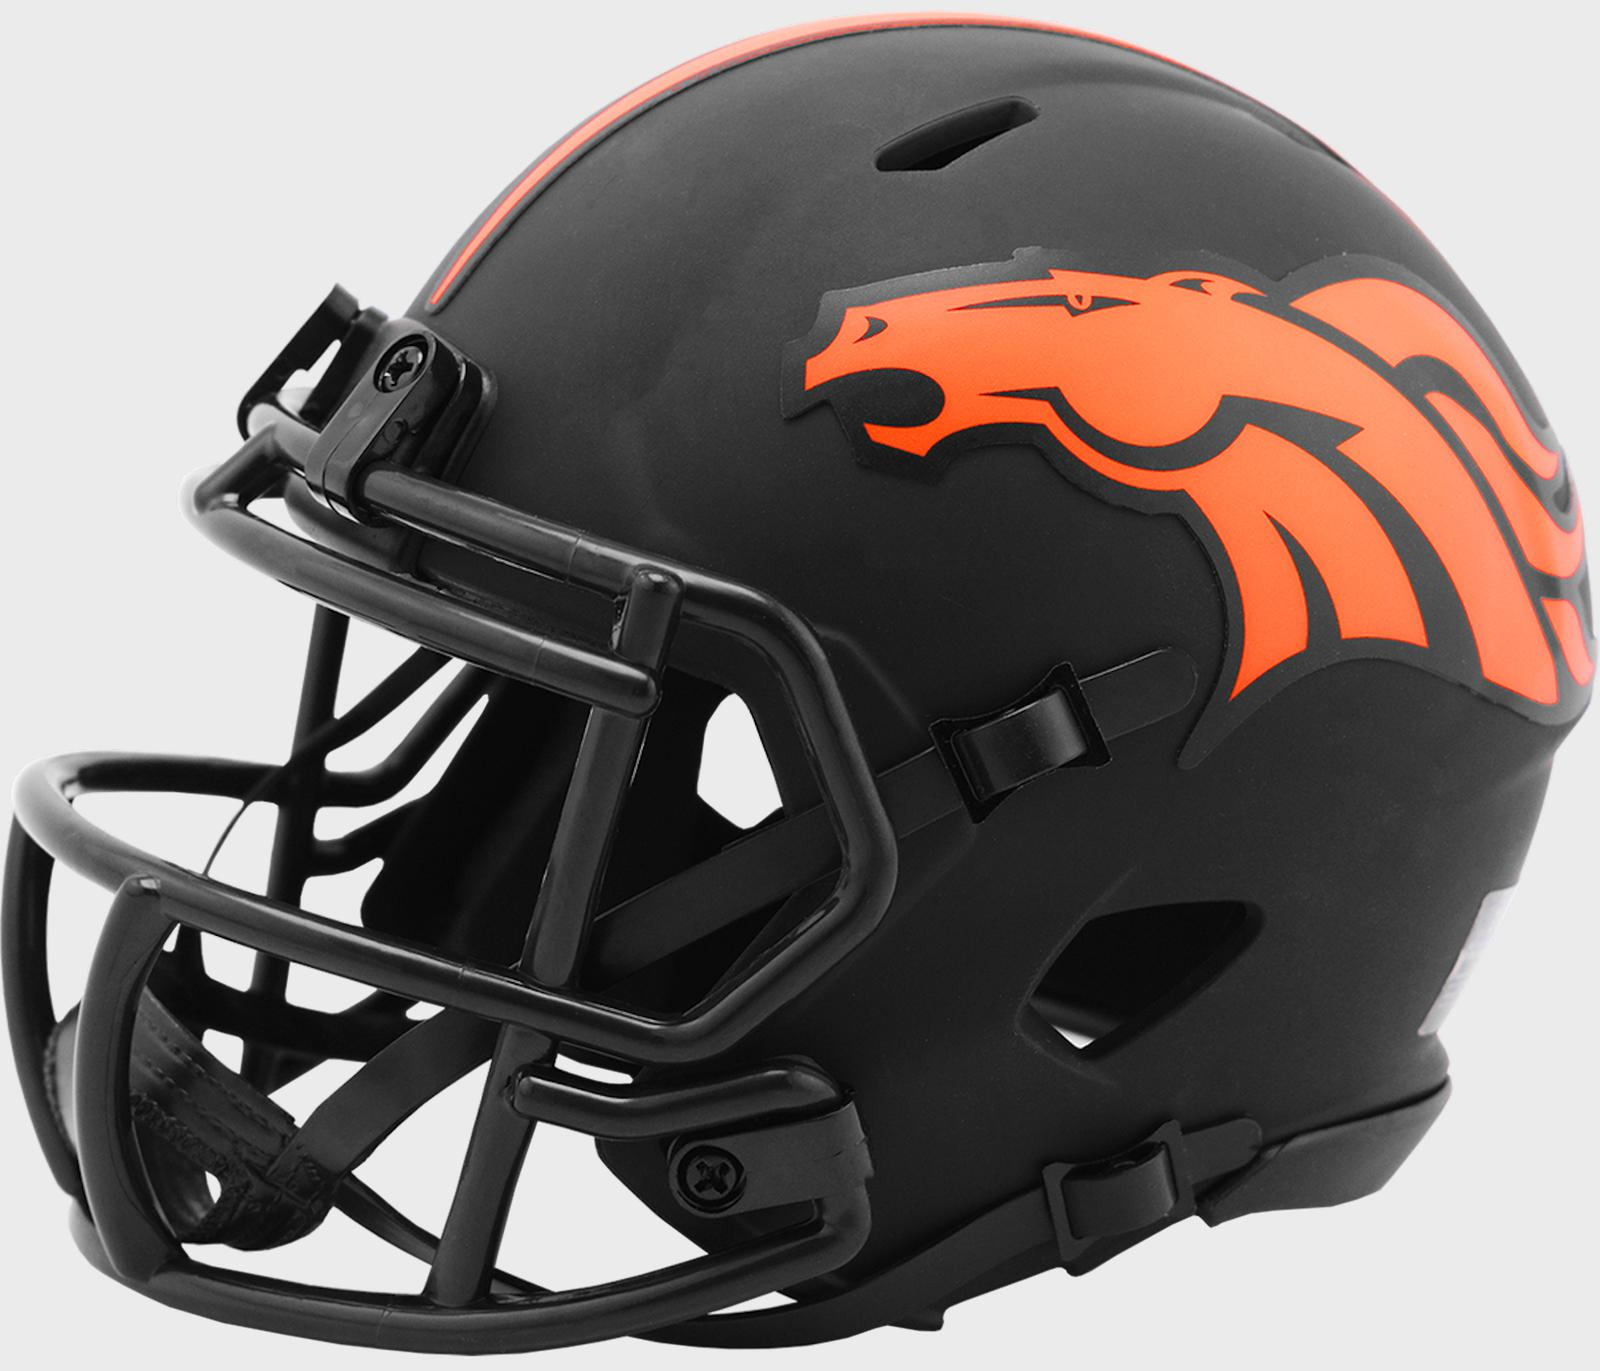 DENVER BRONCOS NFL Riddell SPEED Mini Football Helmet BLACK